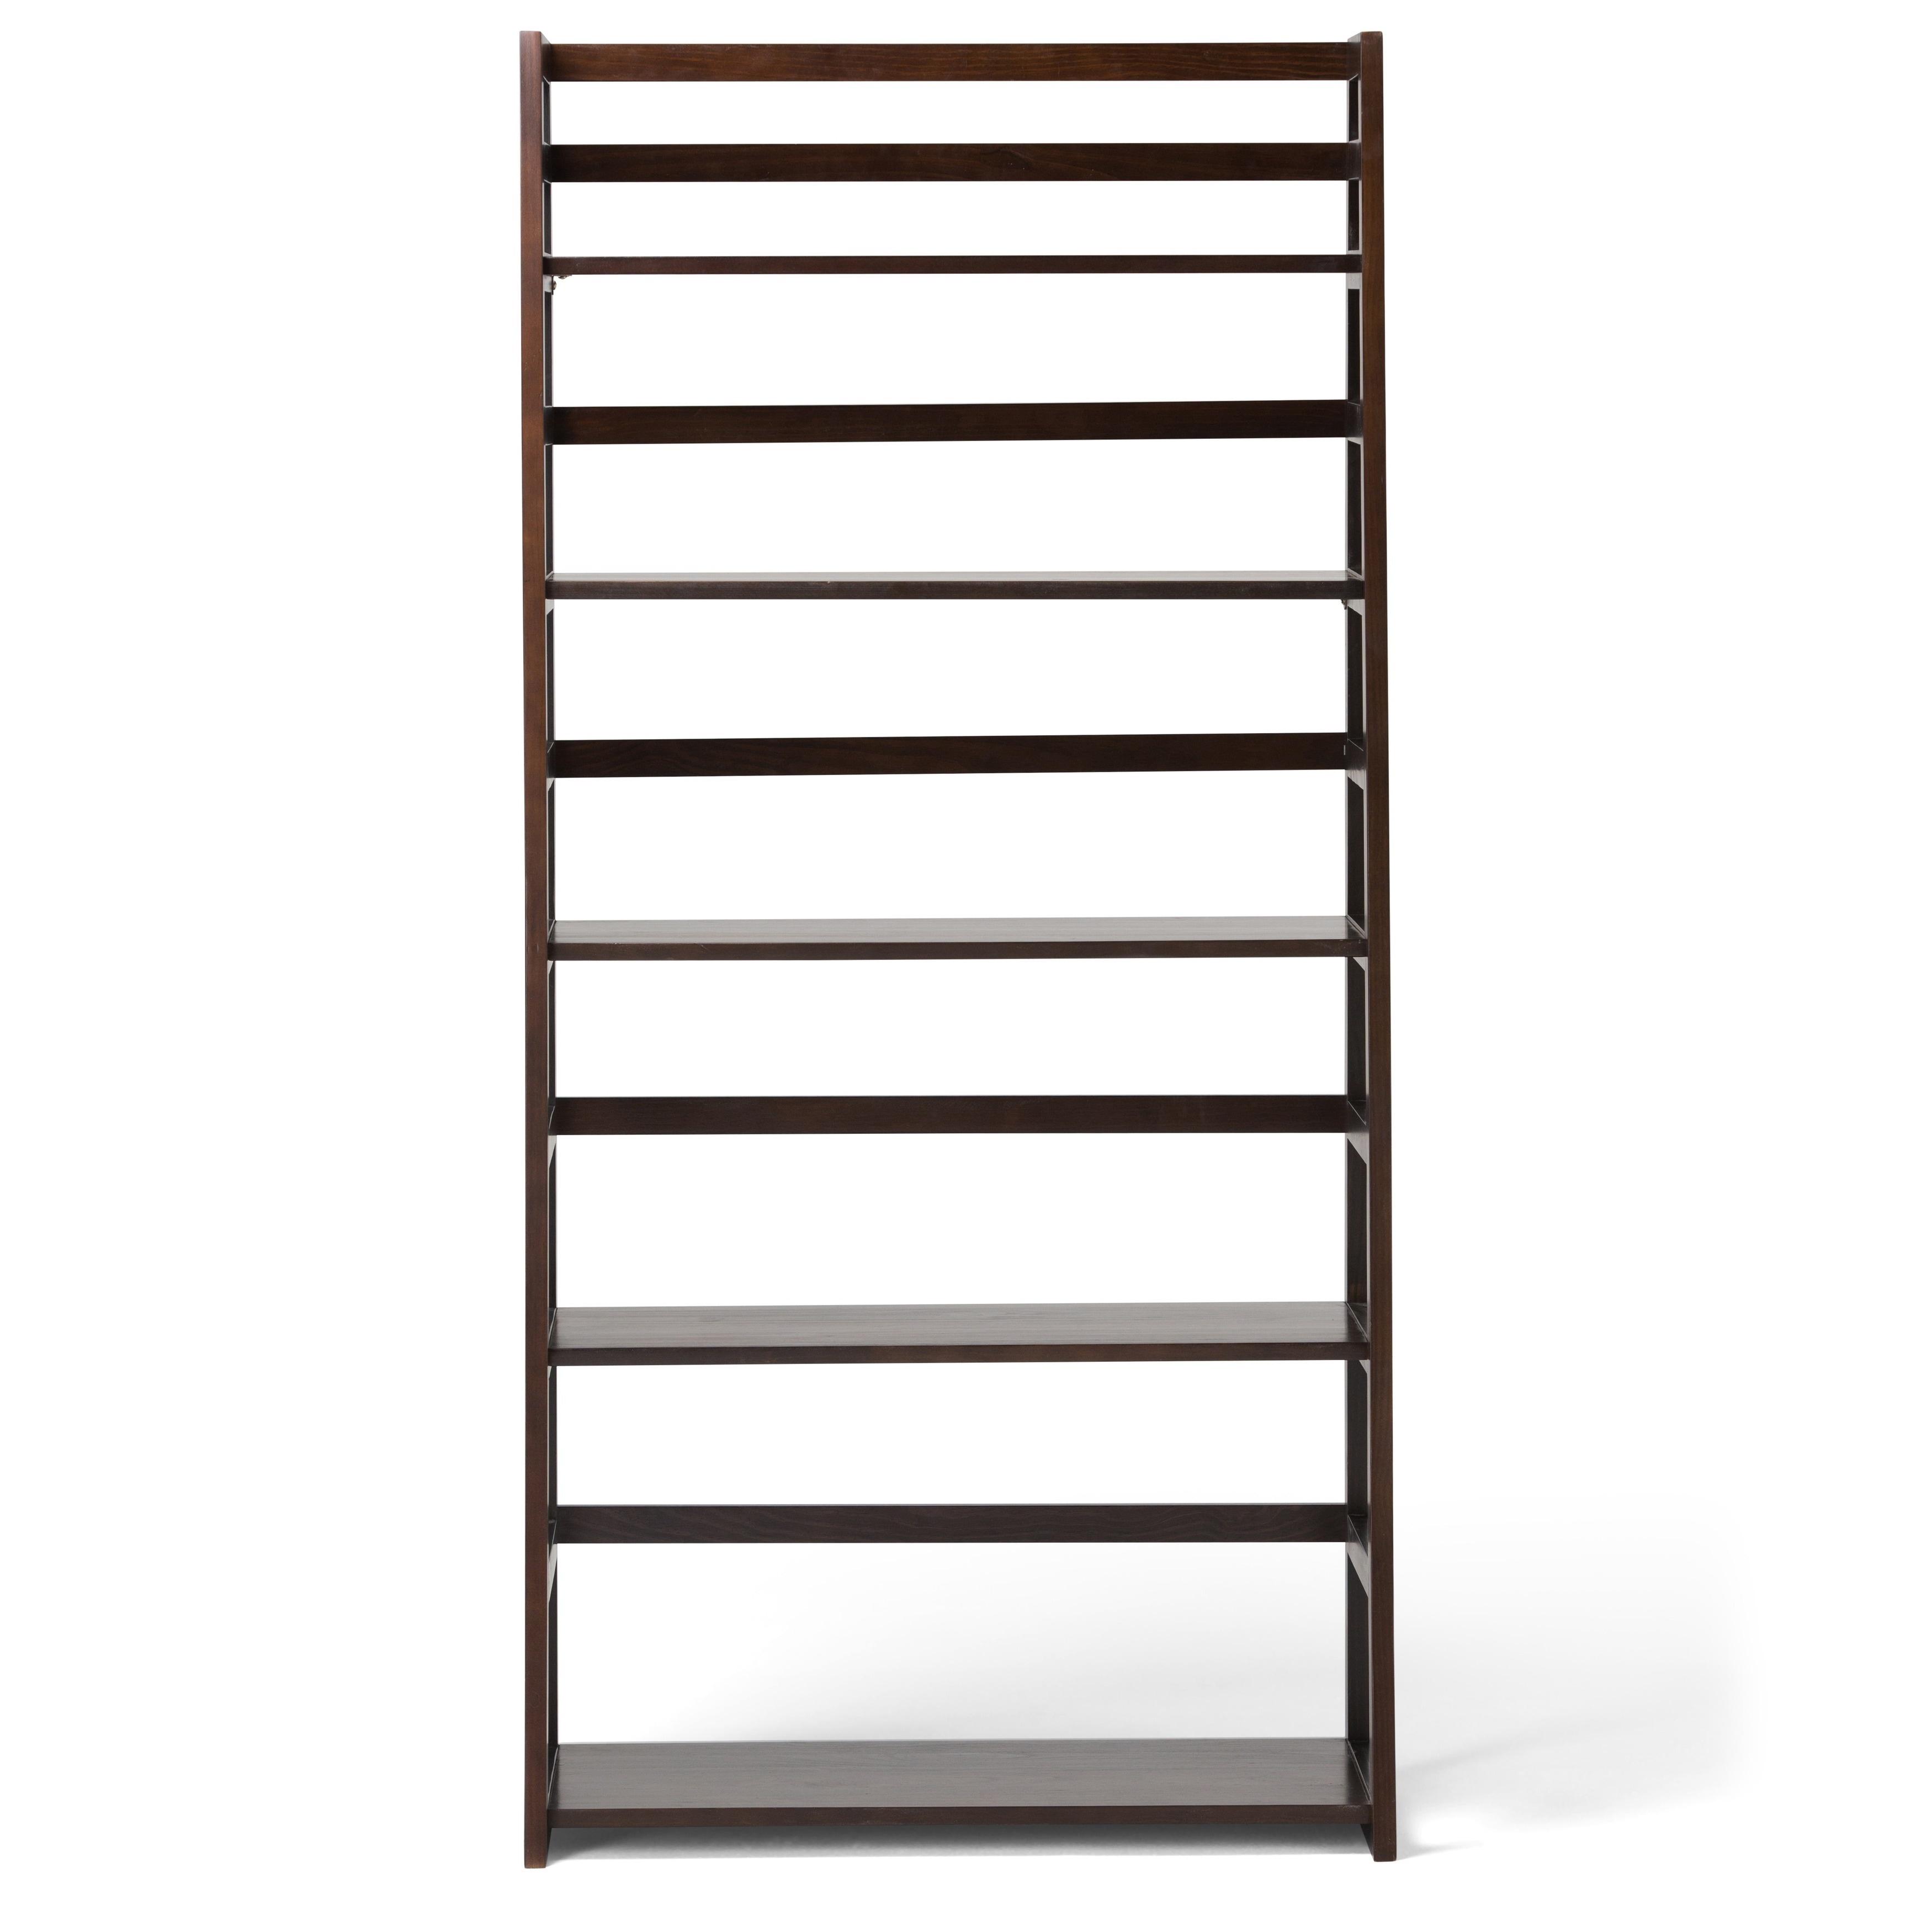 Wyndenhall Normandy Pine Wood Ladder Shelf Bookcase  Free Shipping